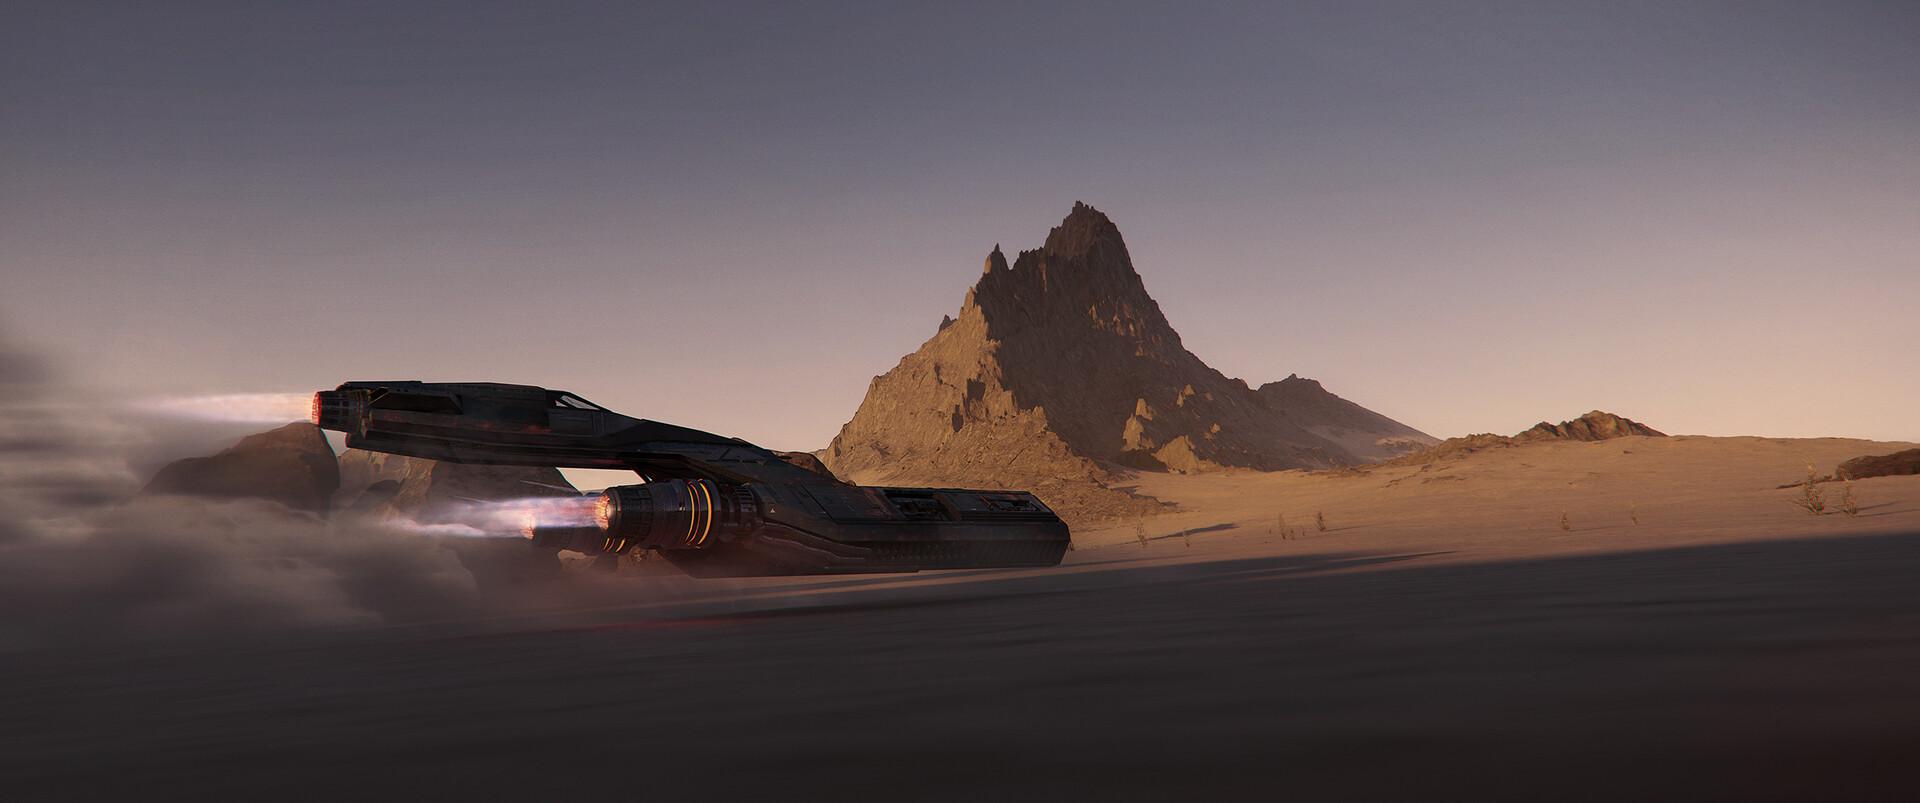 tom-sterckx-desert-spaceship-painting-v1